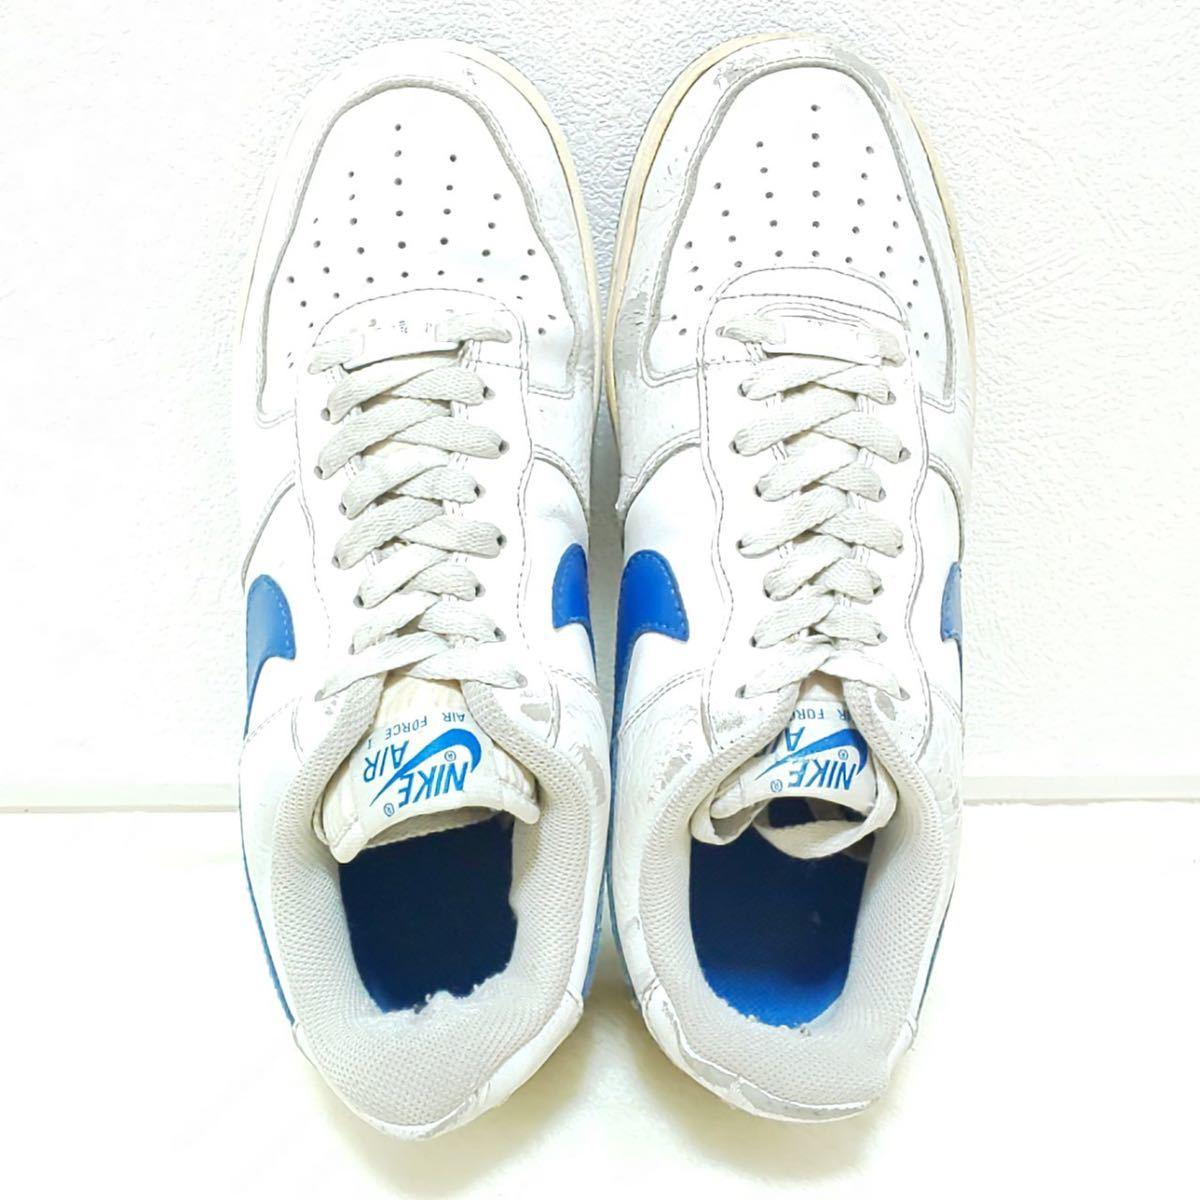 '07【NIKE】ナイキ AIR FORCE1 エアーフォースワン ローカット スニーカー シューズ 靴 ホワイト ブルー カジュアル ストリート 25.5cm/jx_画像6